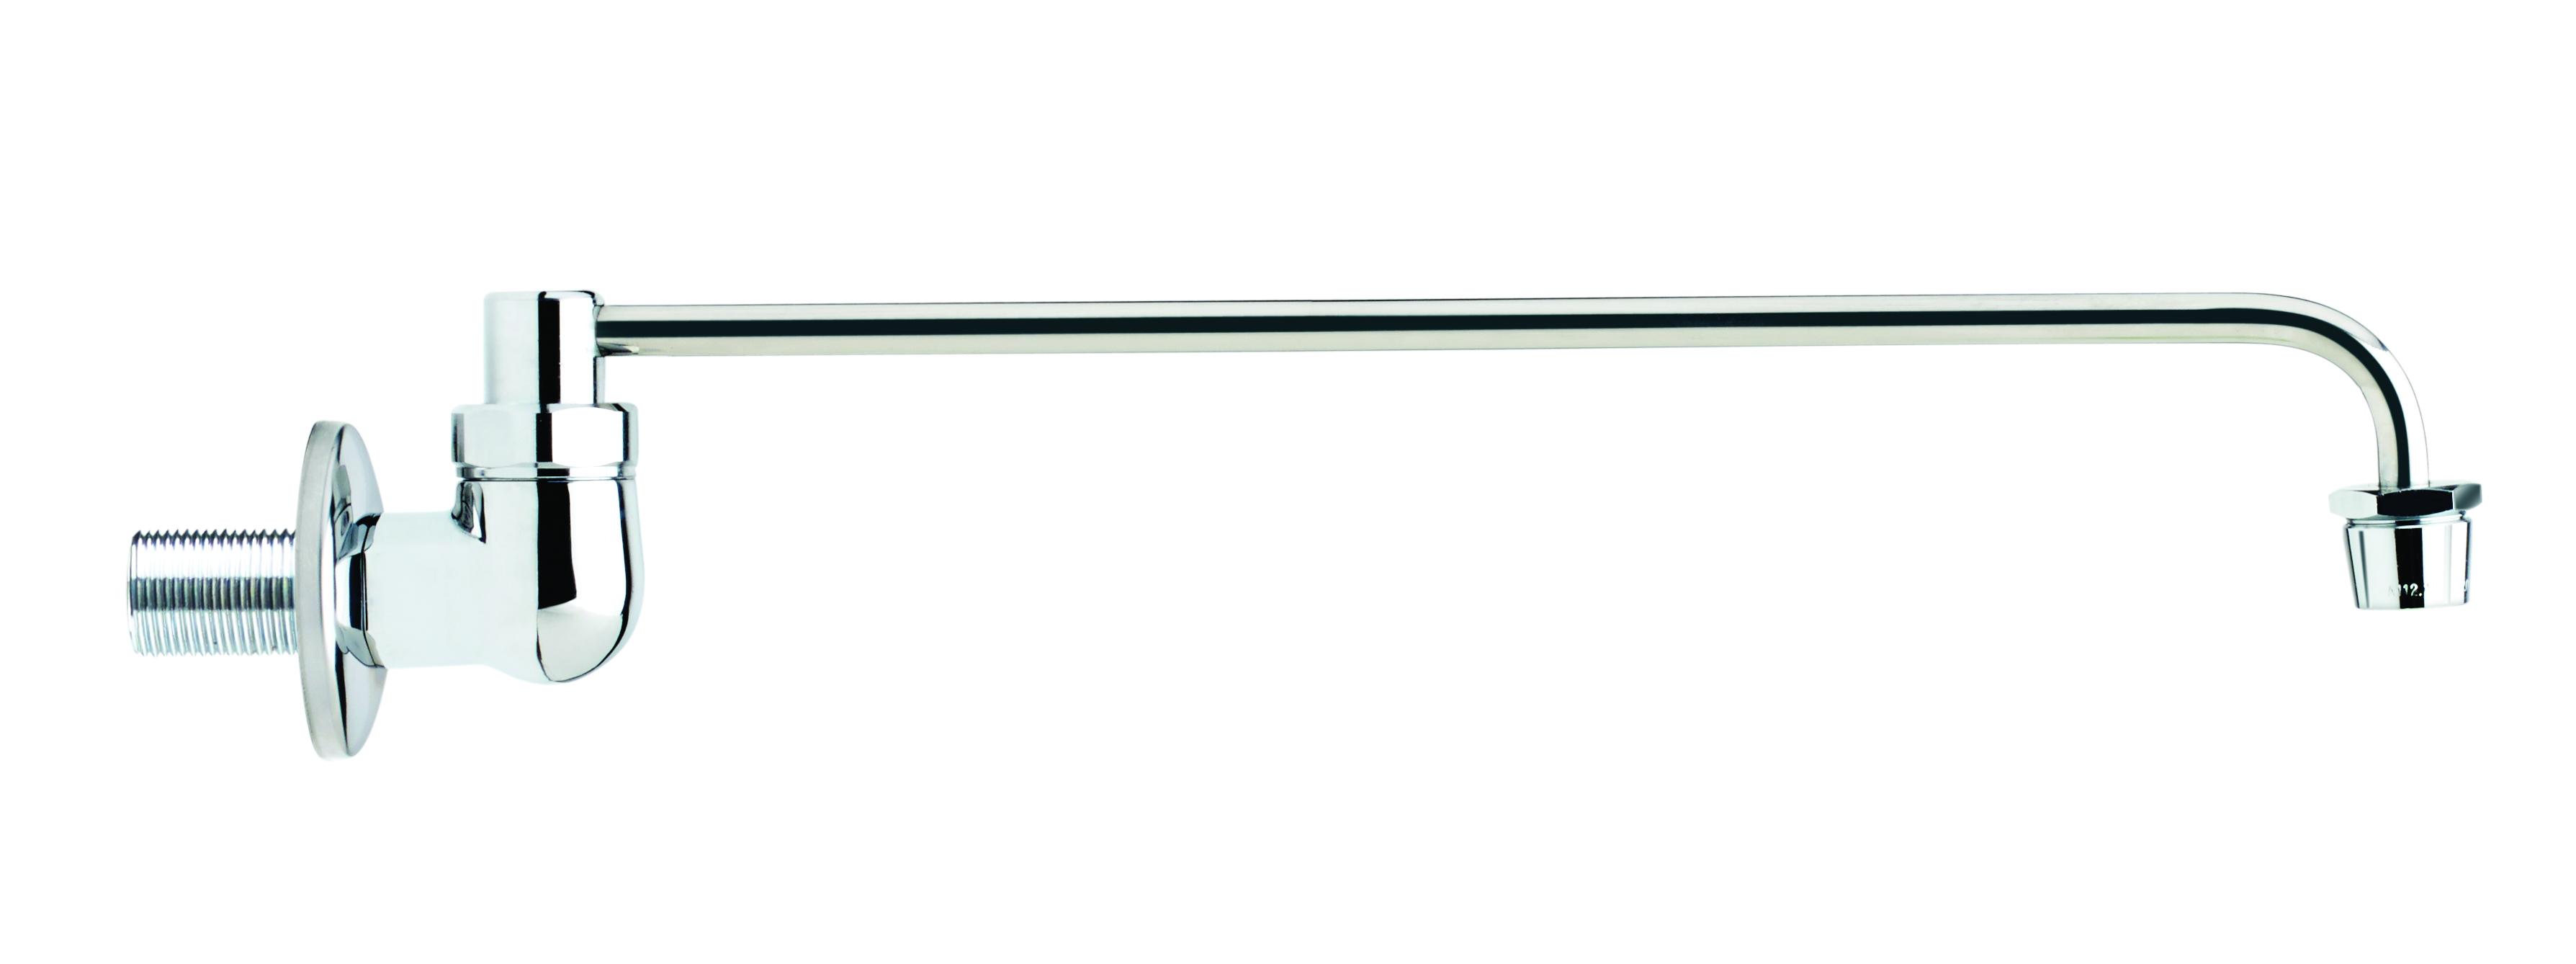 Krowne Metal 16-228L faucet, wok / range filler